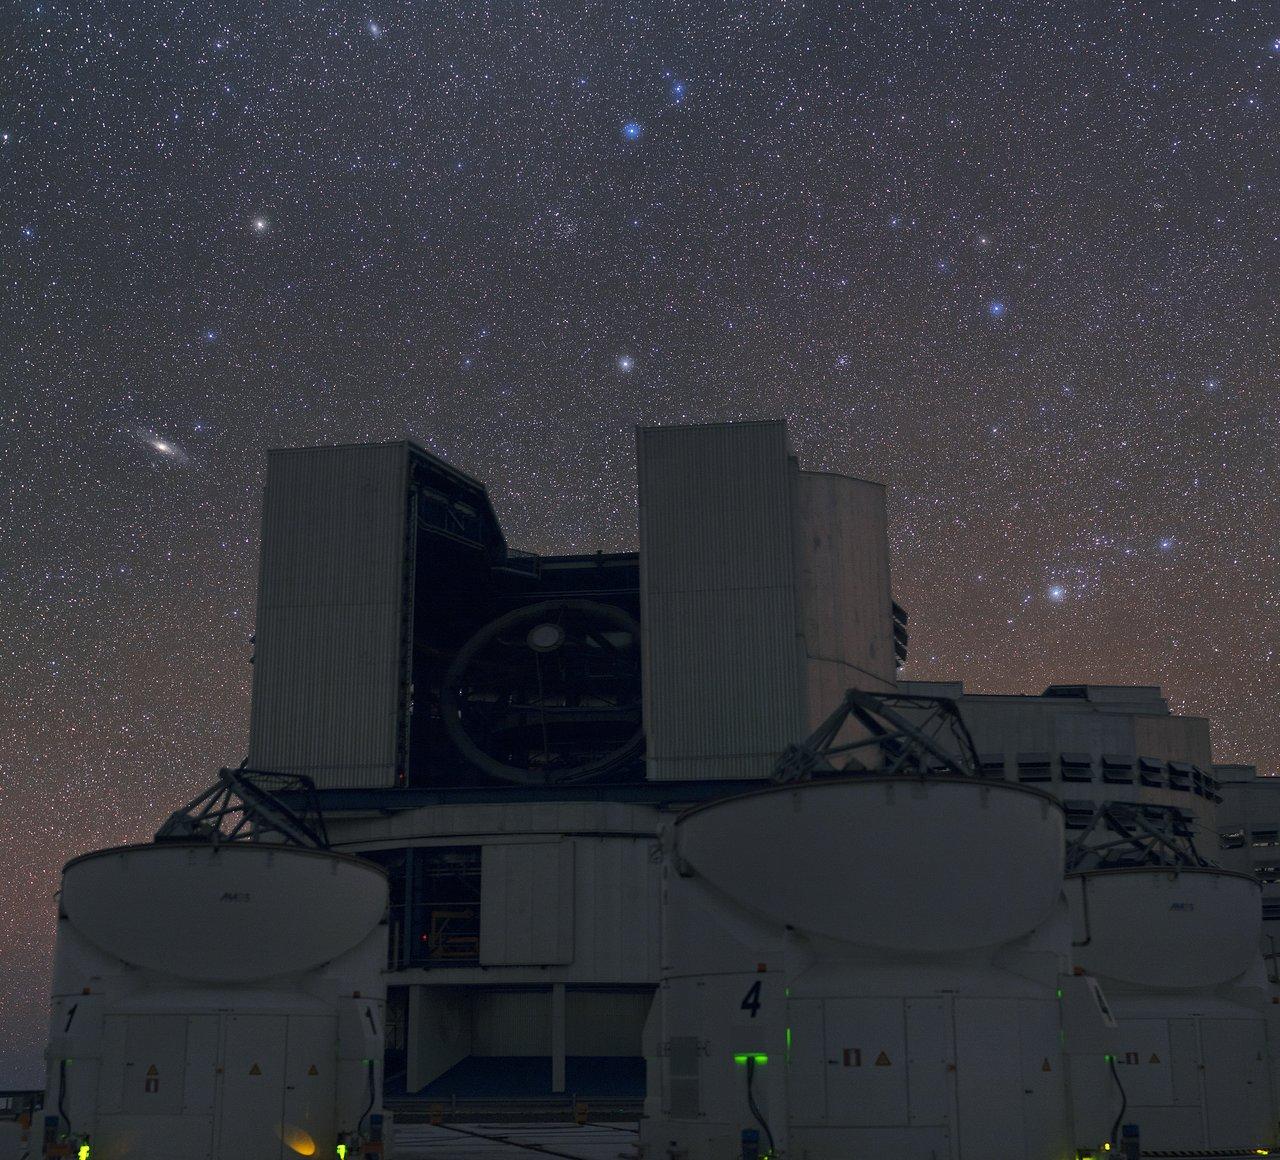 Andromeda galaxy through 8 in telescope